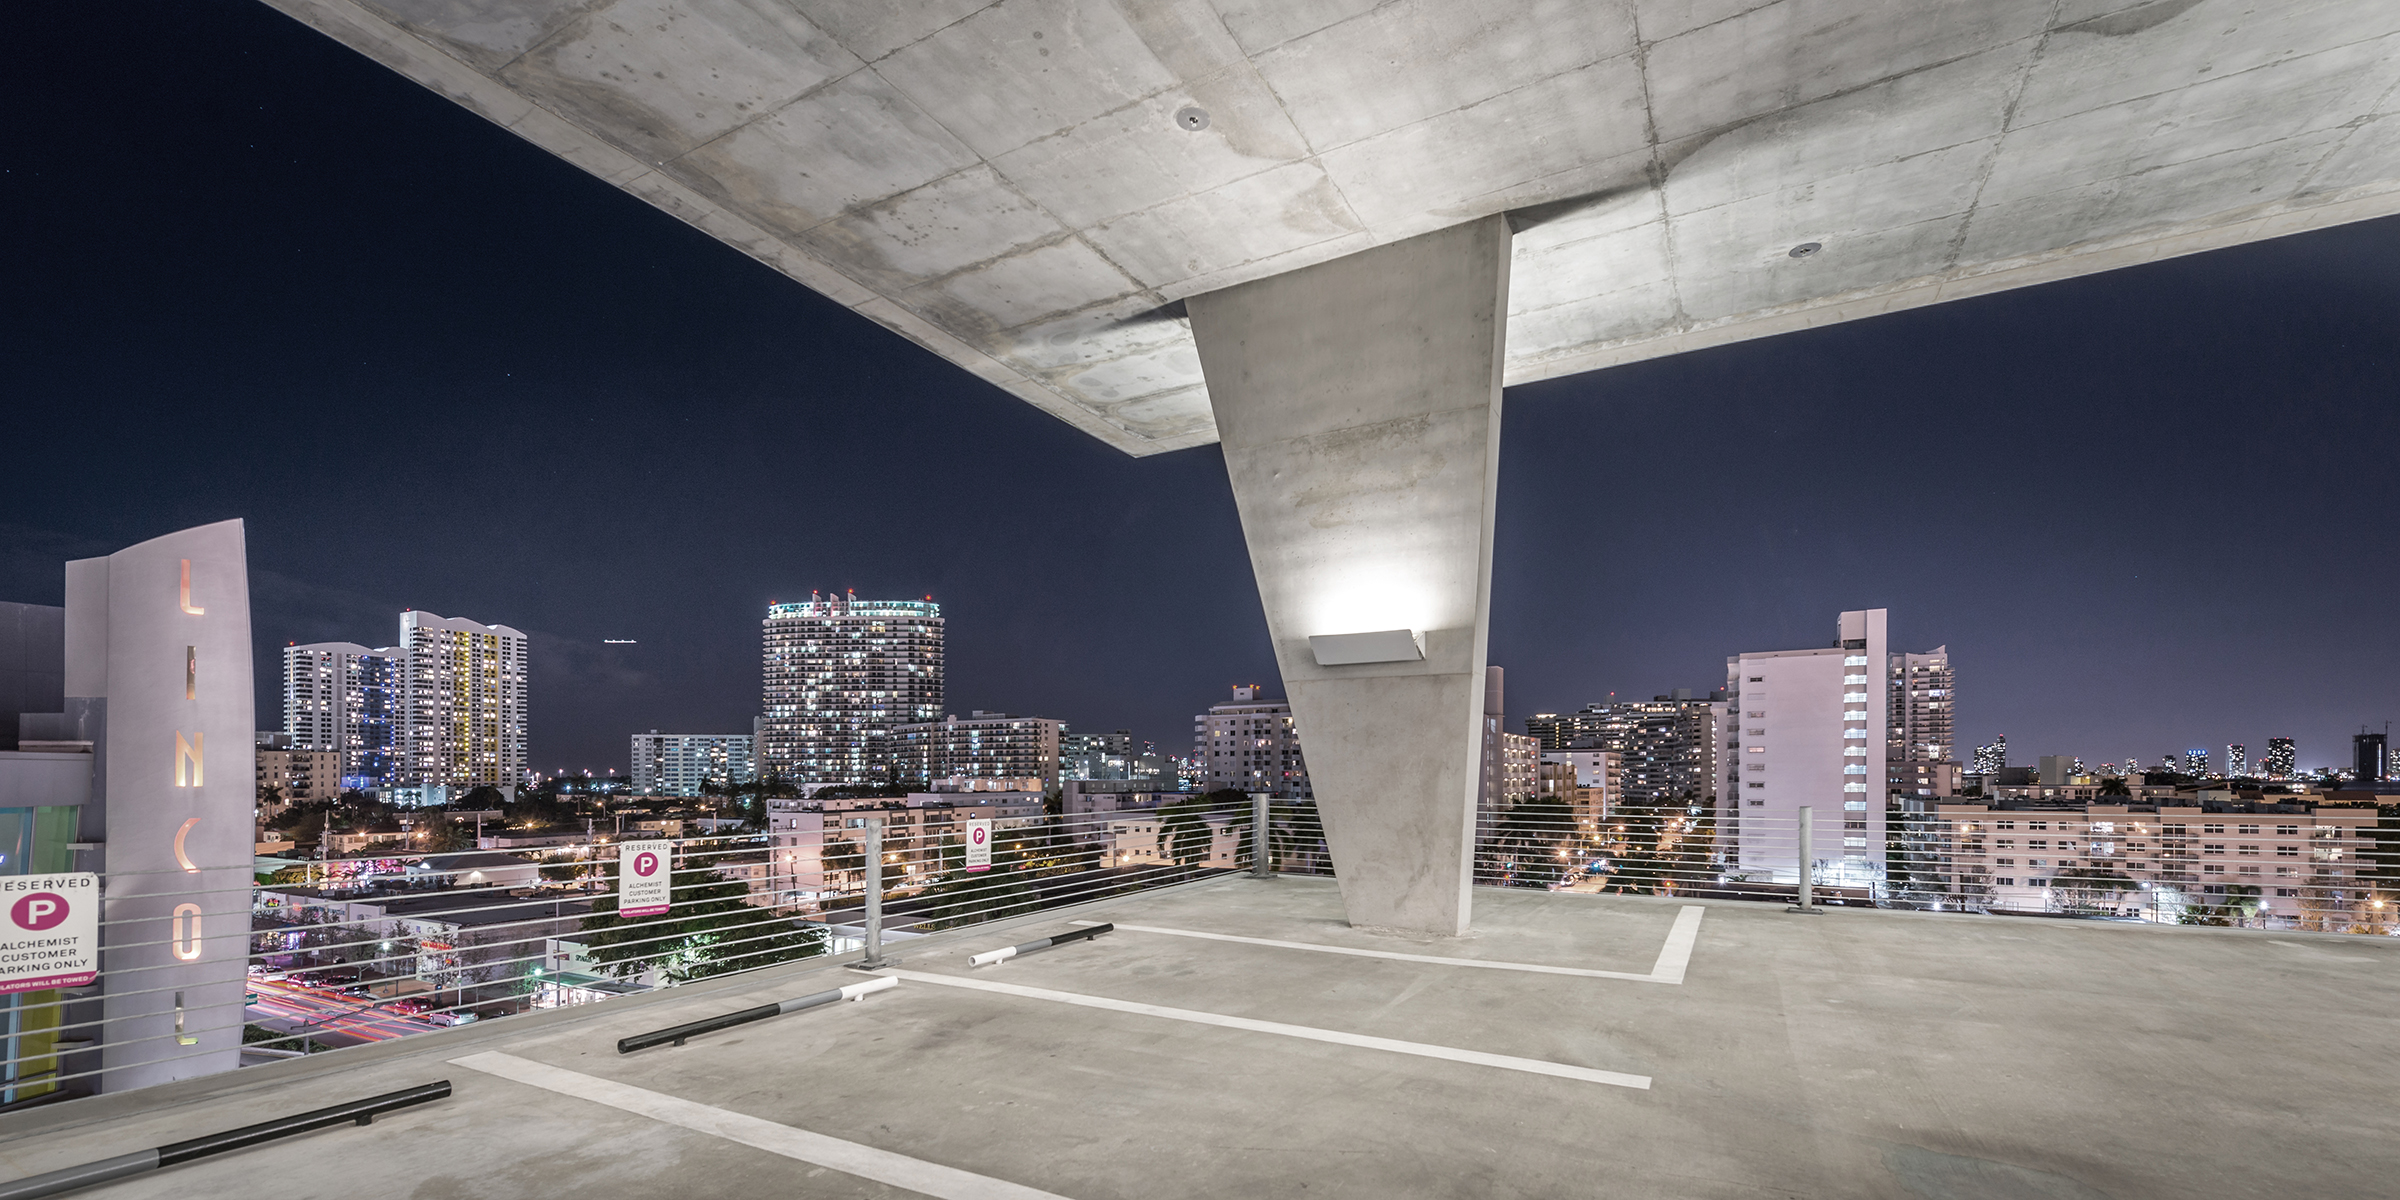 Lincoln parking, Miami Beach